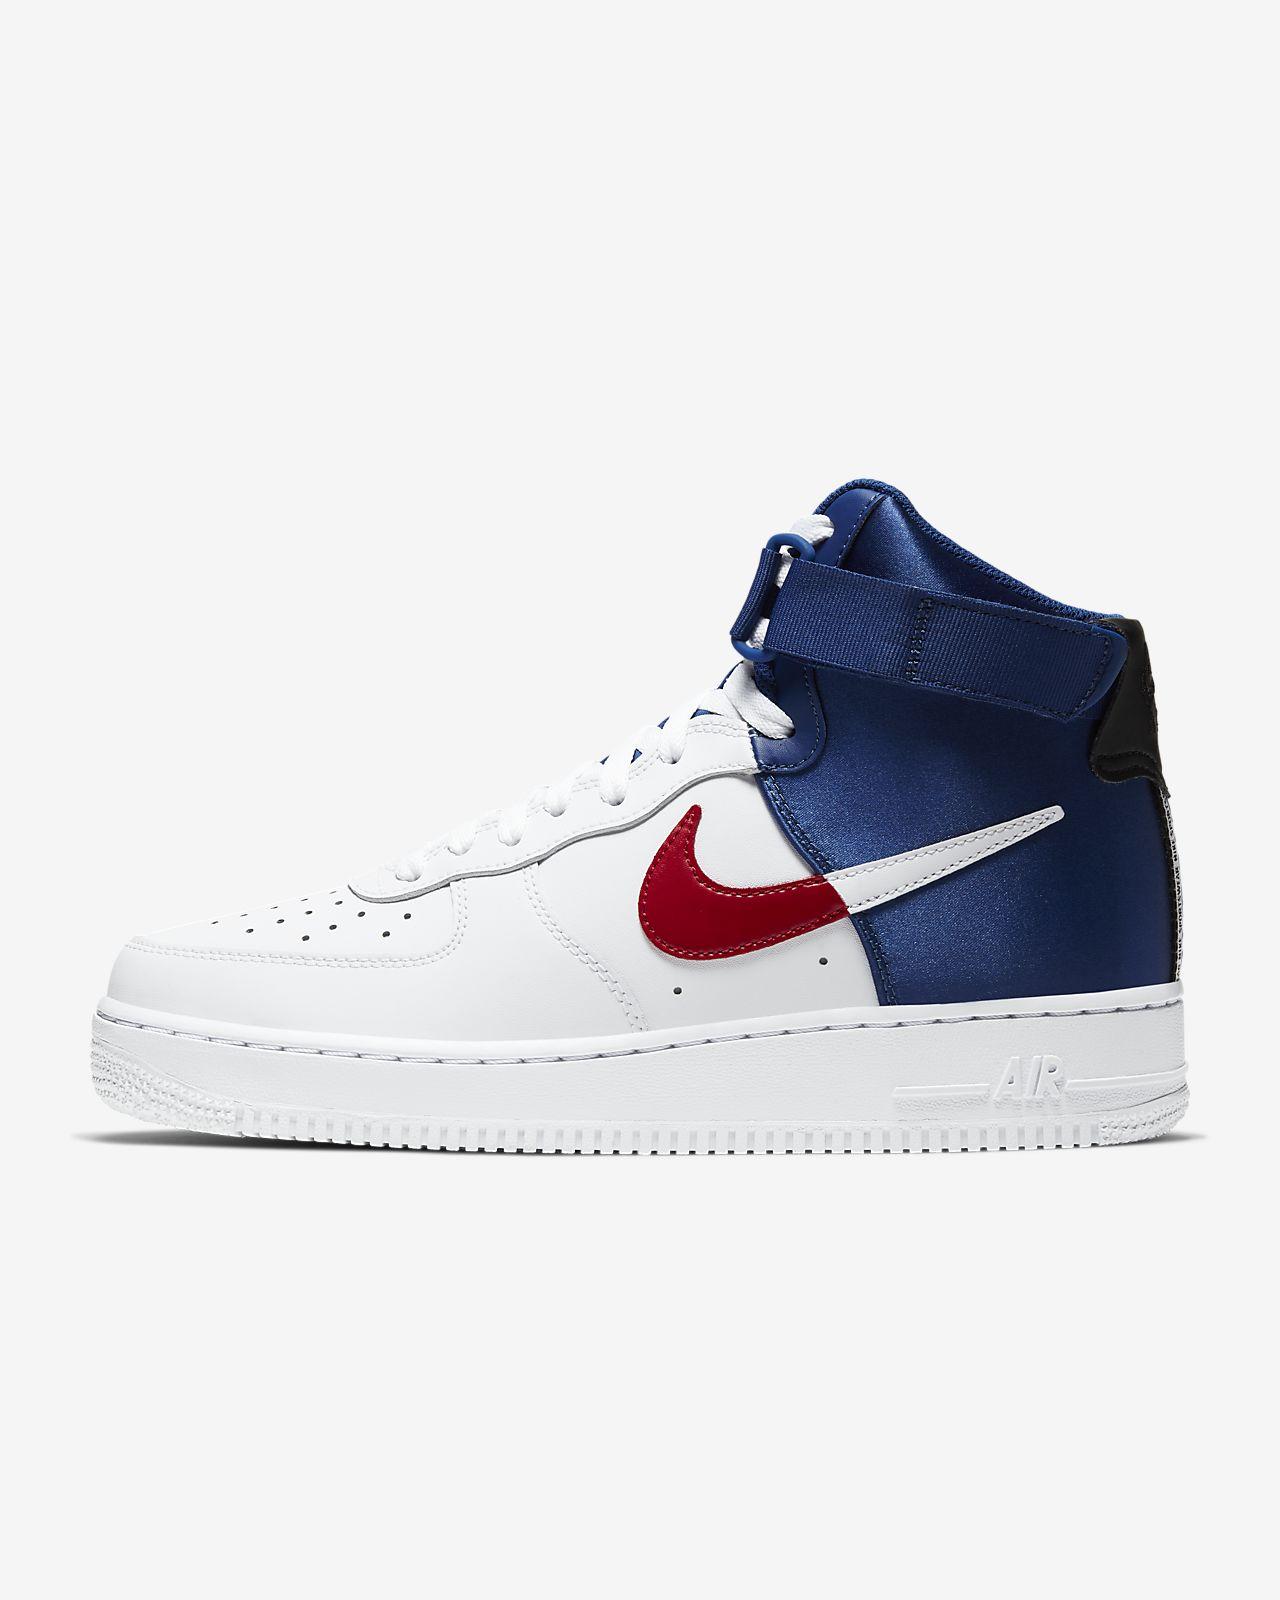 Nike Air Force 1 High '07 LV8 Shoe